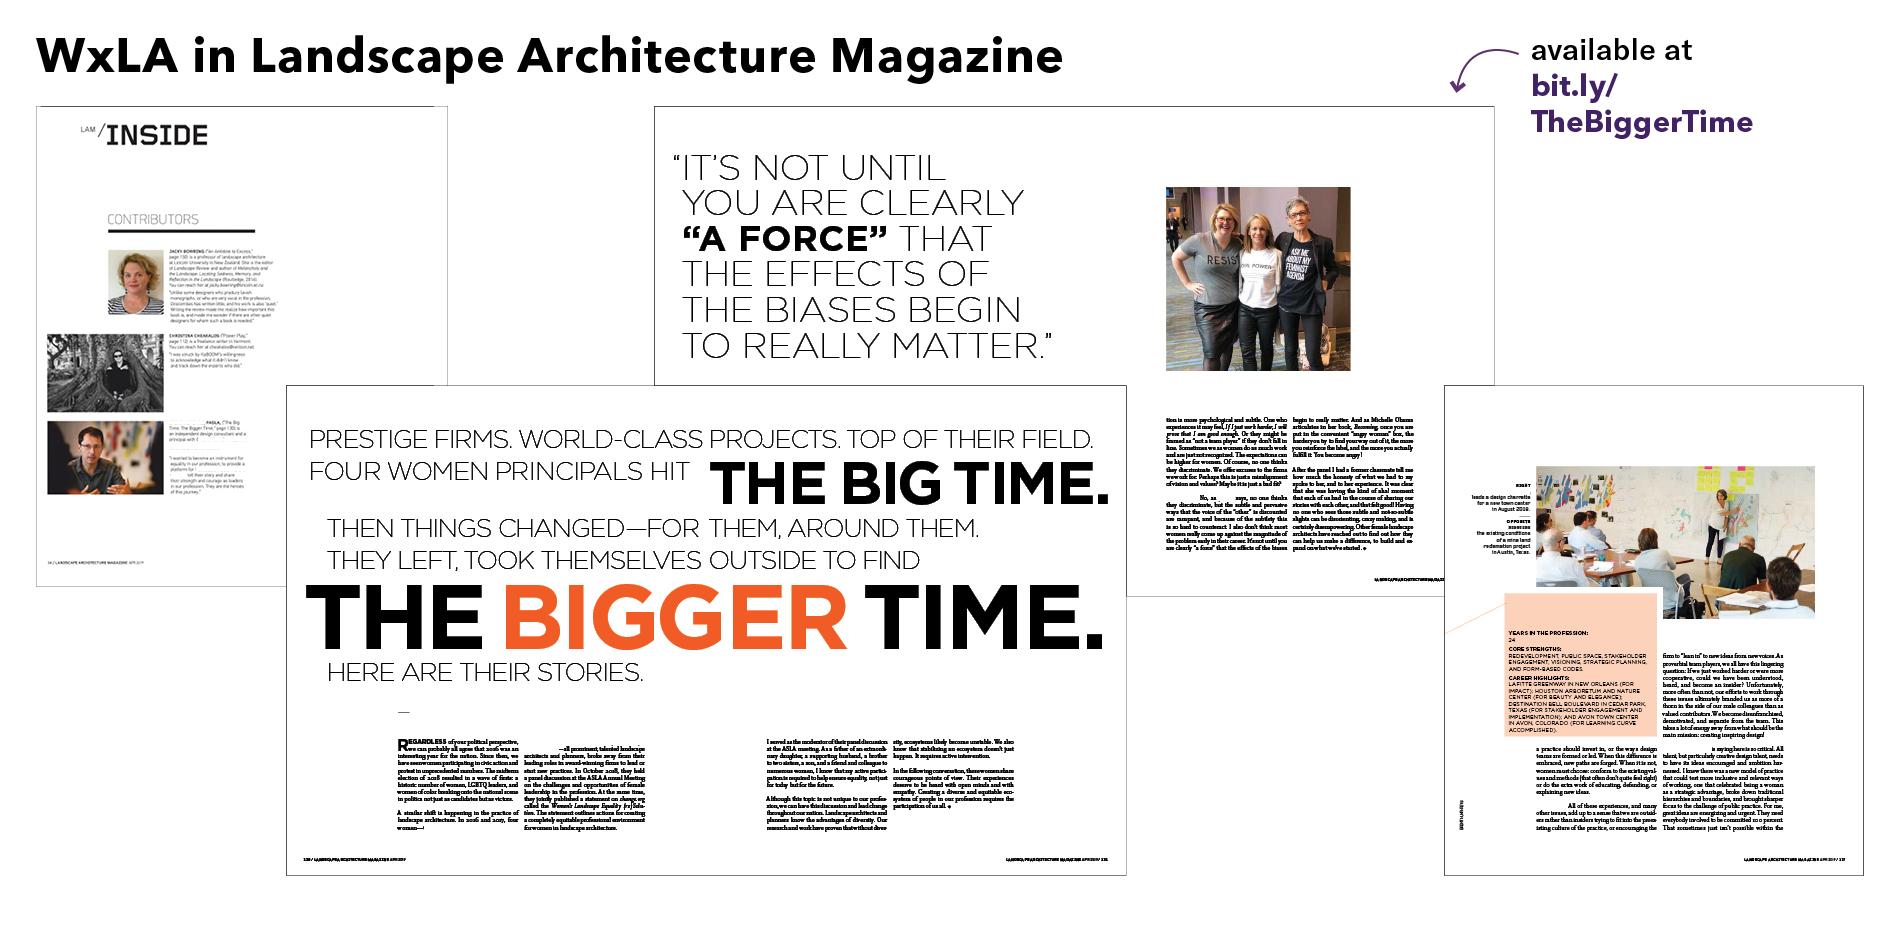 WxLA in Landscape Architecture Magazine